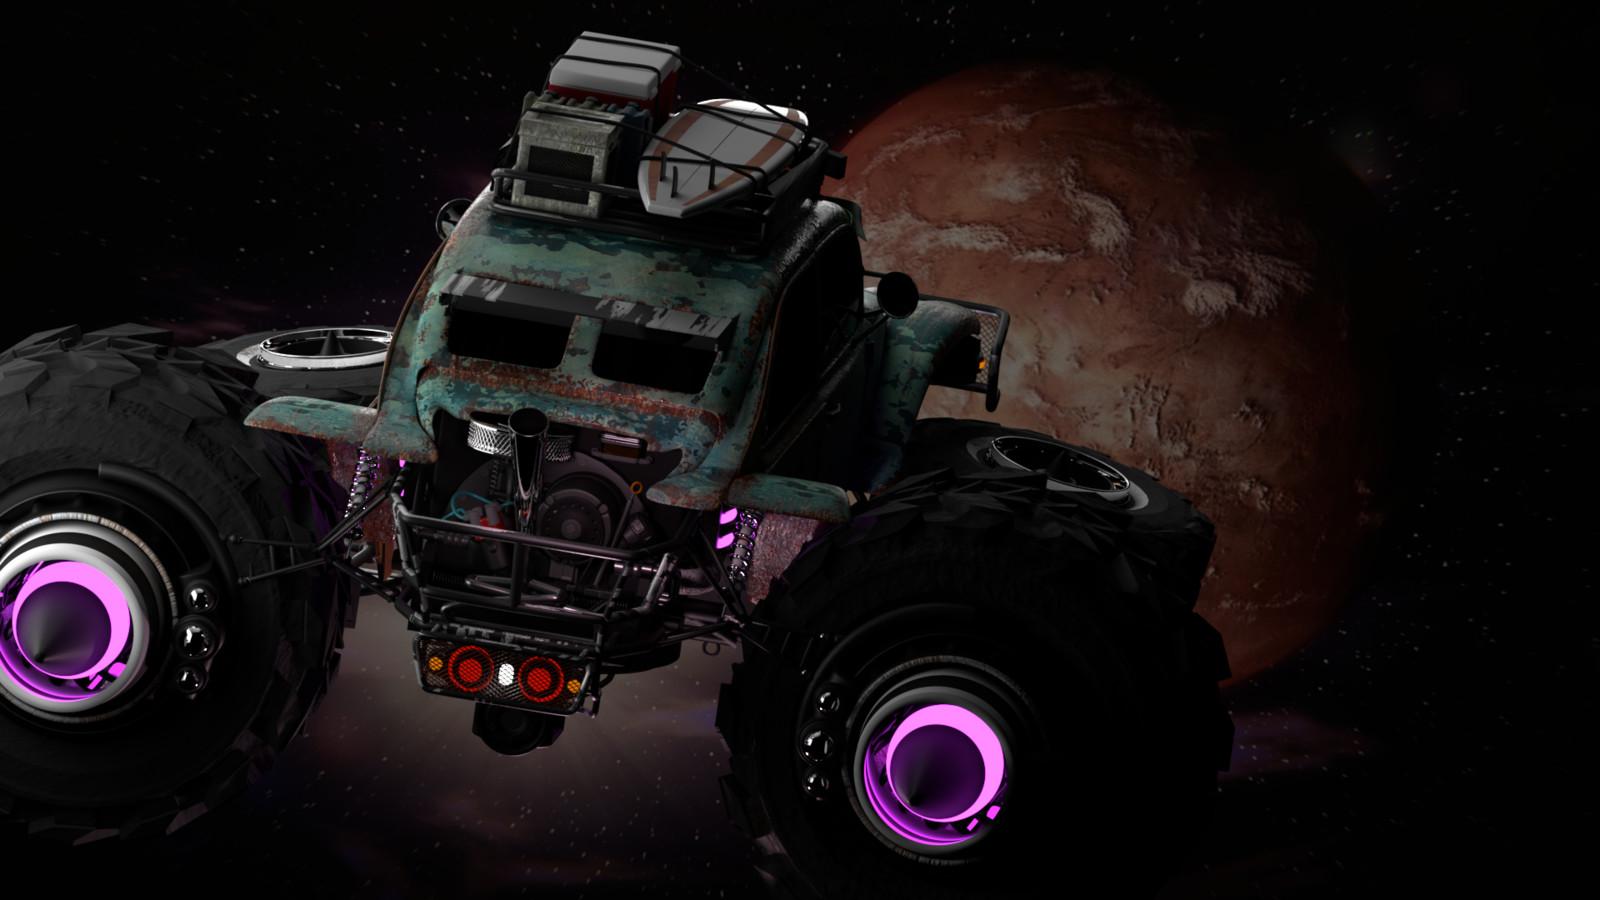 Baja Space Bug reaching destination